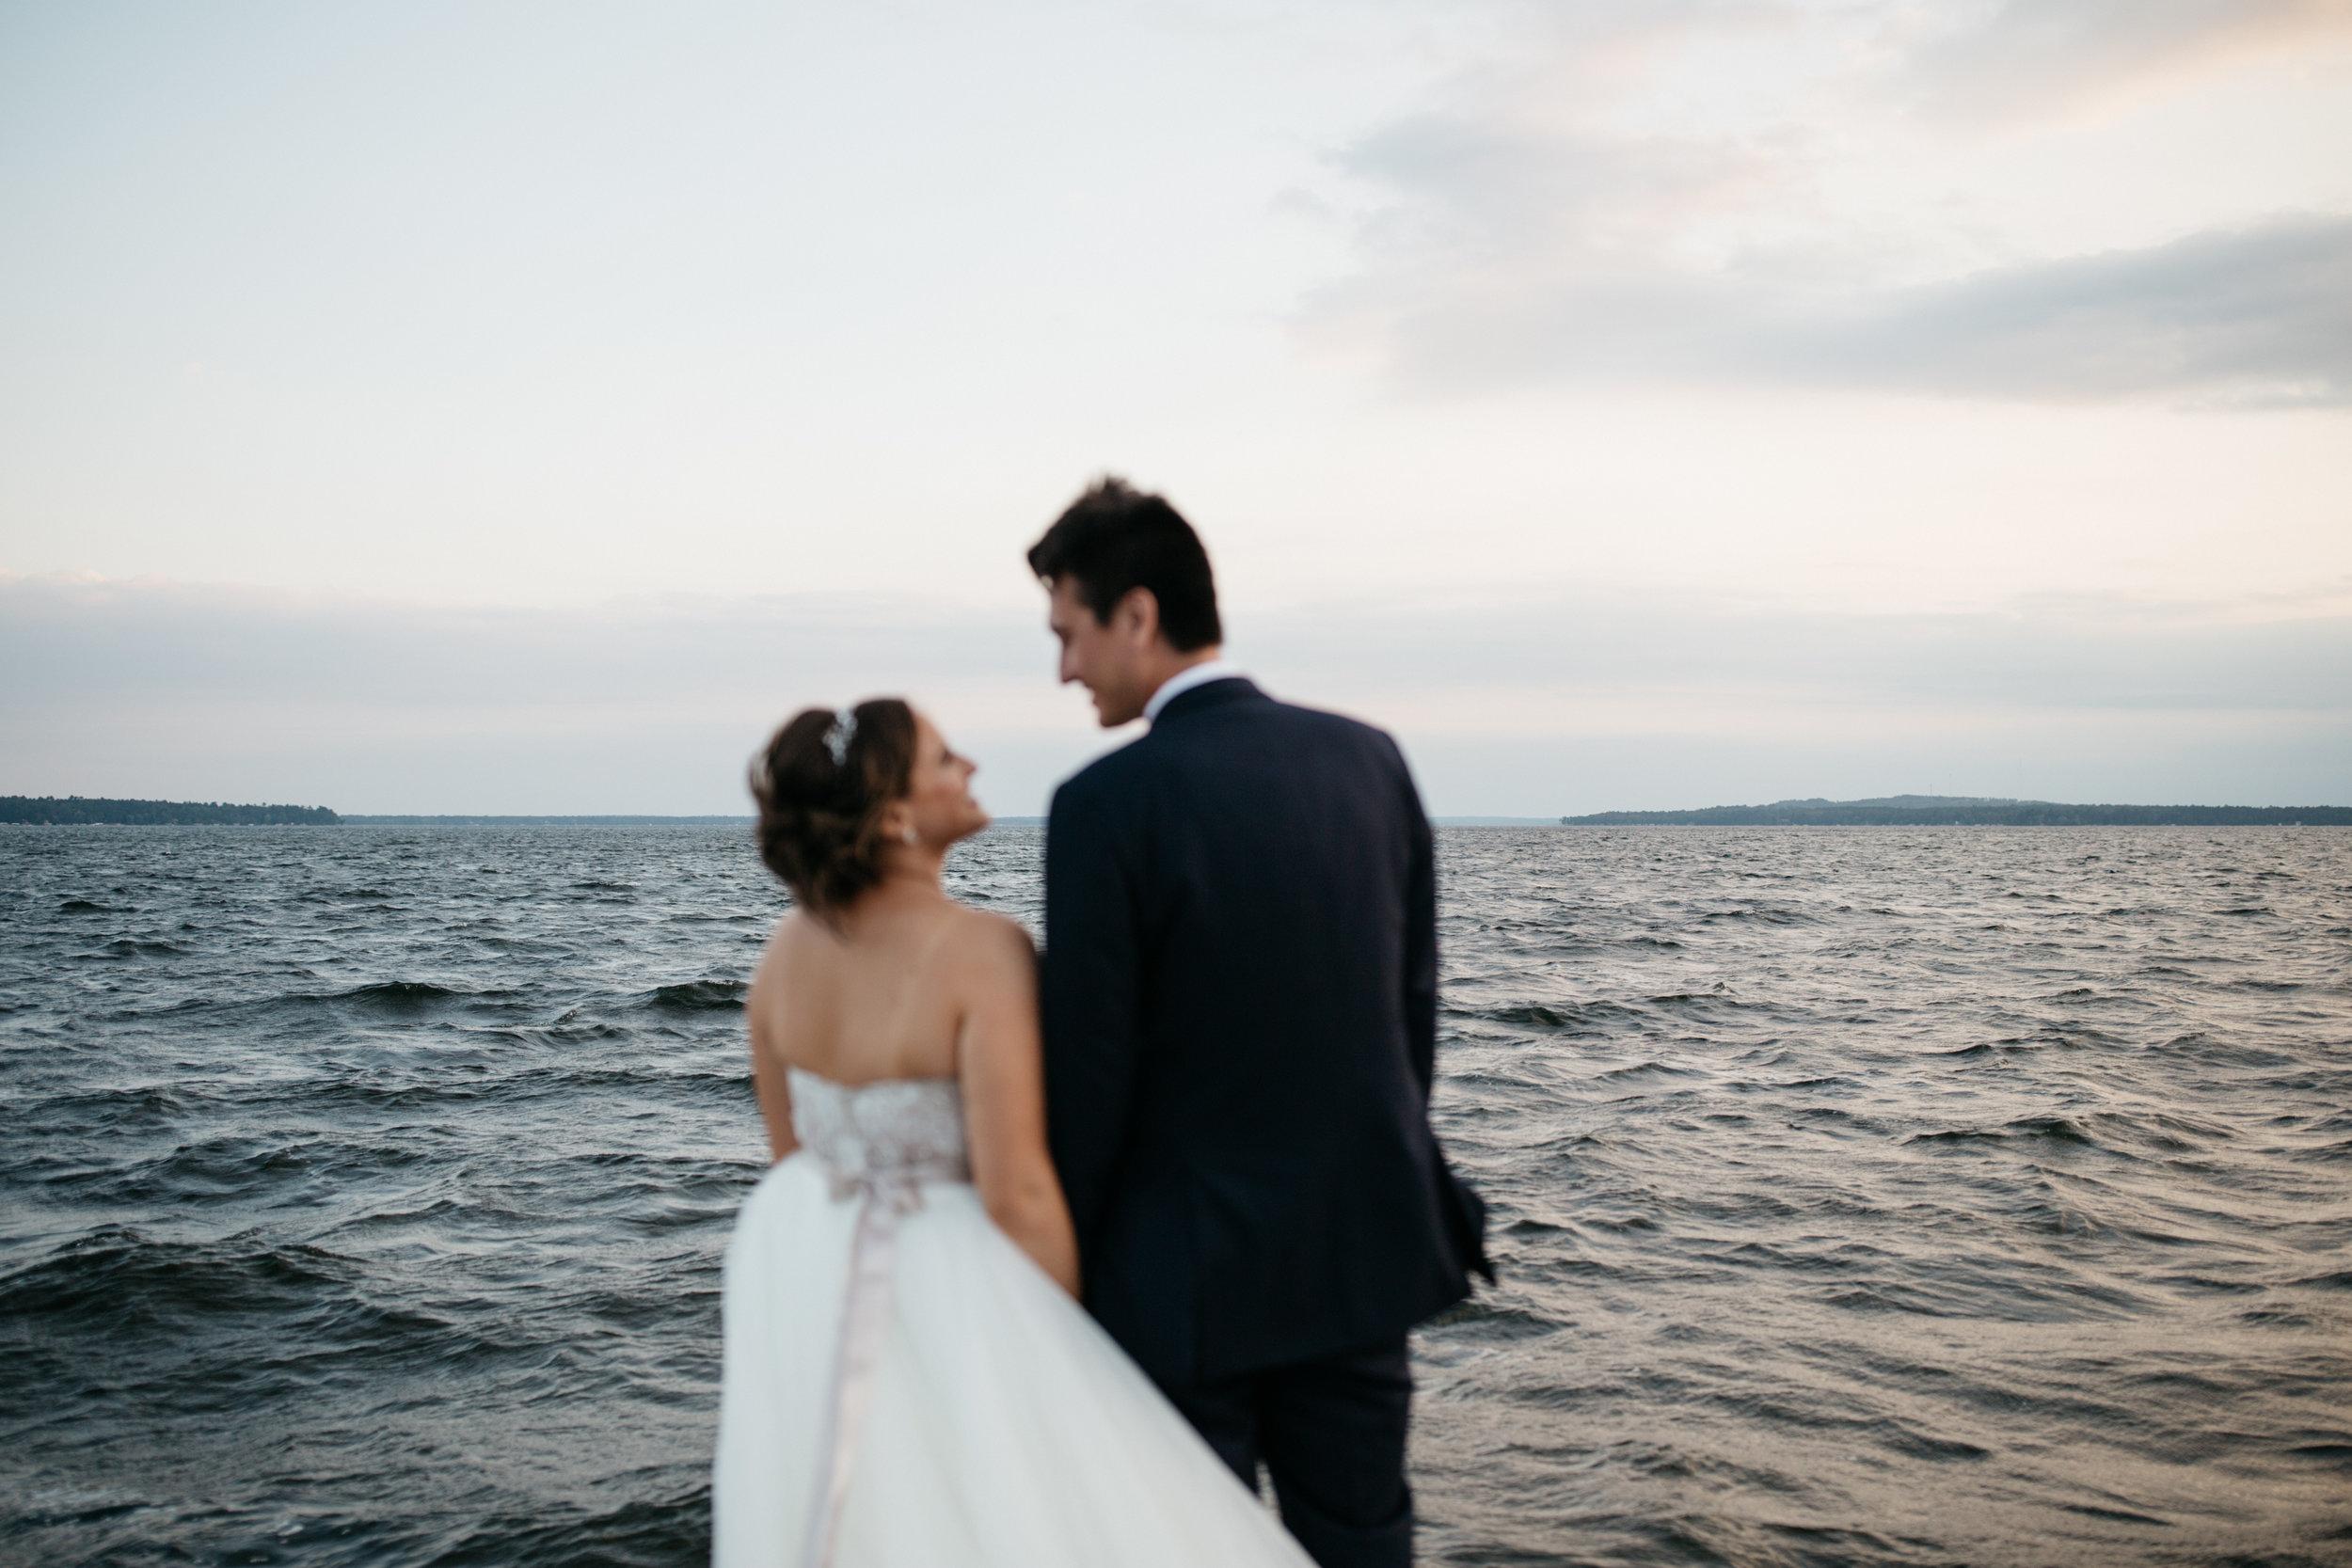 Unique wedding photography by Britt DeZeeuw at Grand View Lodge.